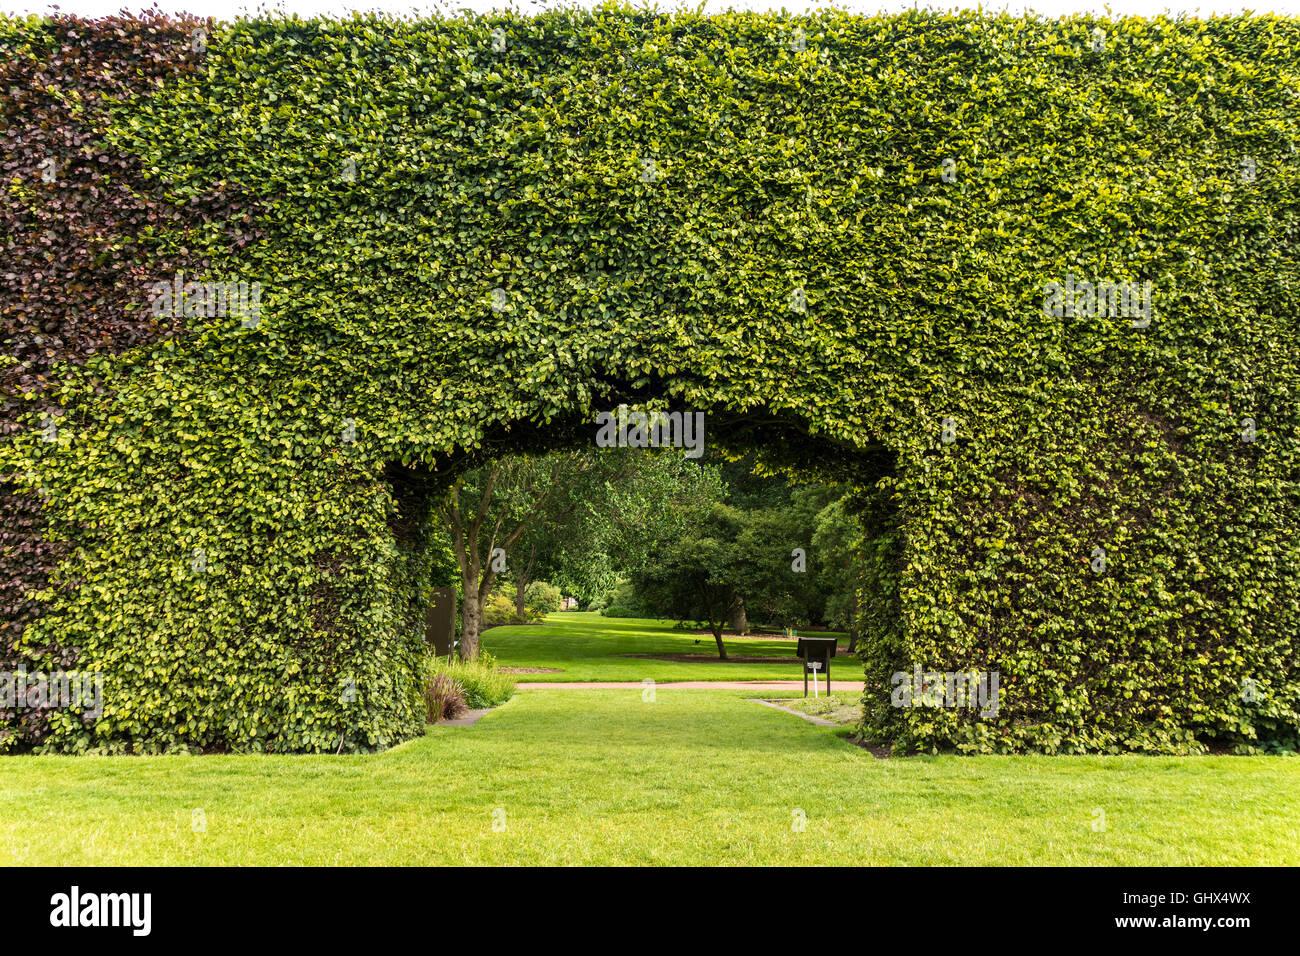 Royal Botanic Garden Edinburgh RBGE. Famoso secolo-vecchia siepe di faggio 8 metri; 23ft alta. Immagini Stock